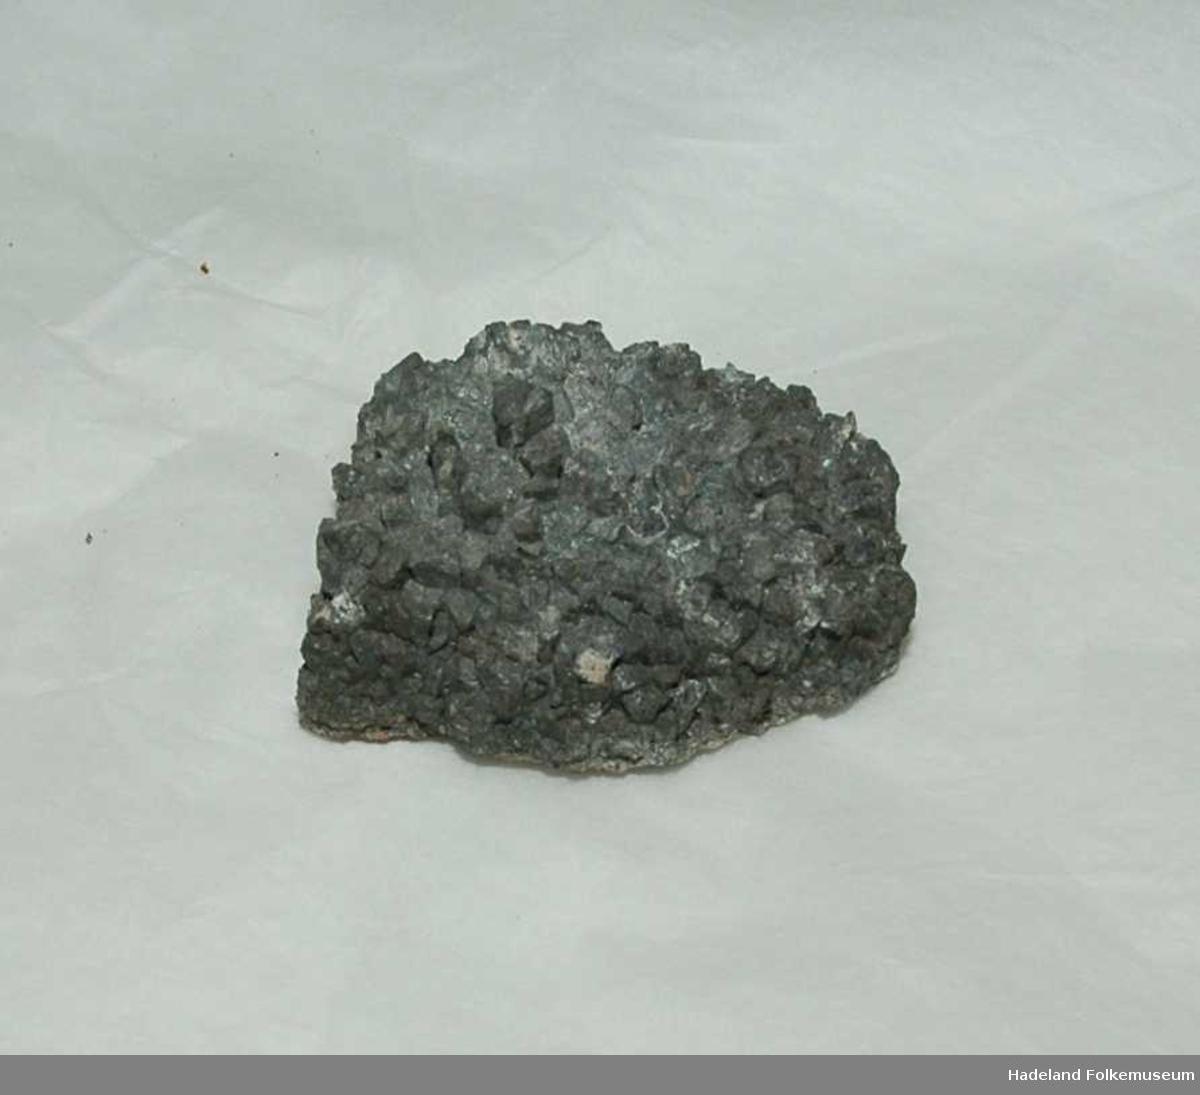 Stein, antimonglans